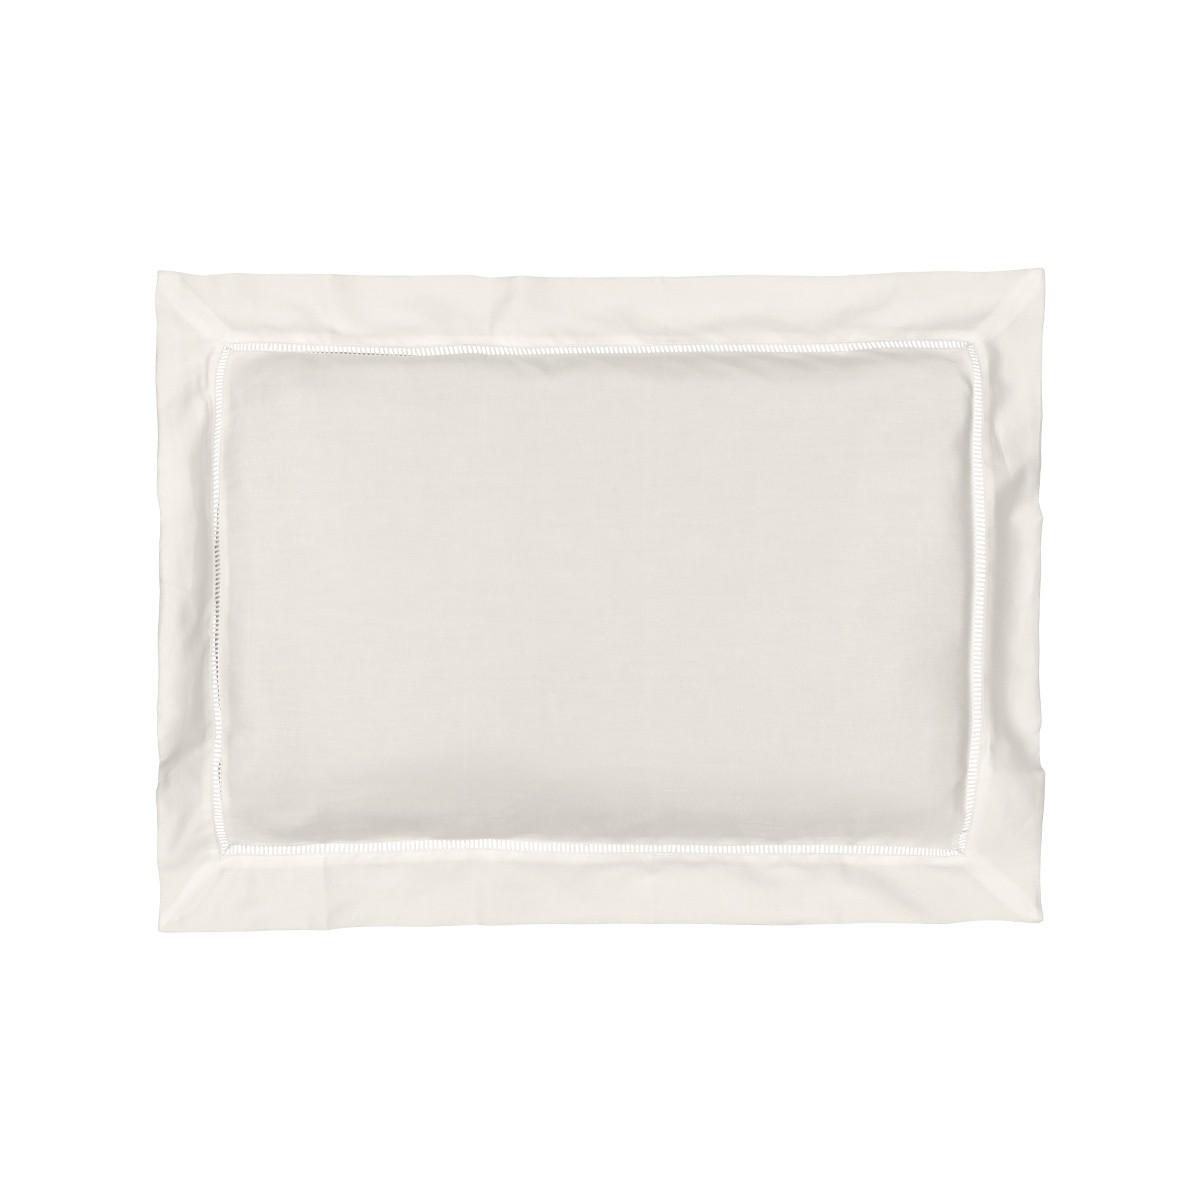 Venezia Pillow Case, Cream White